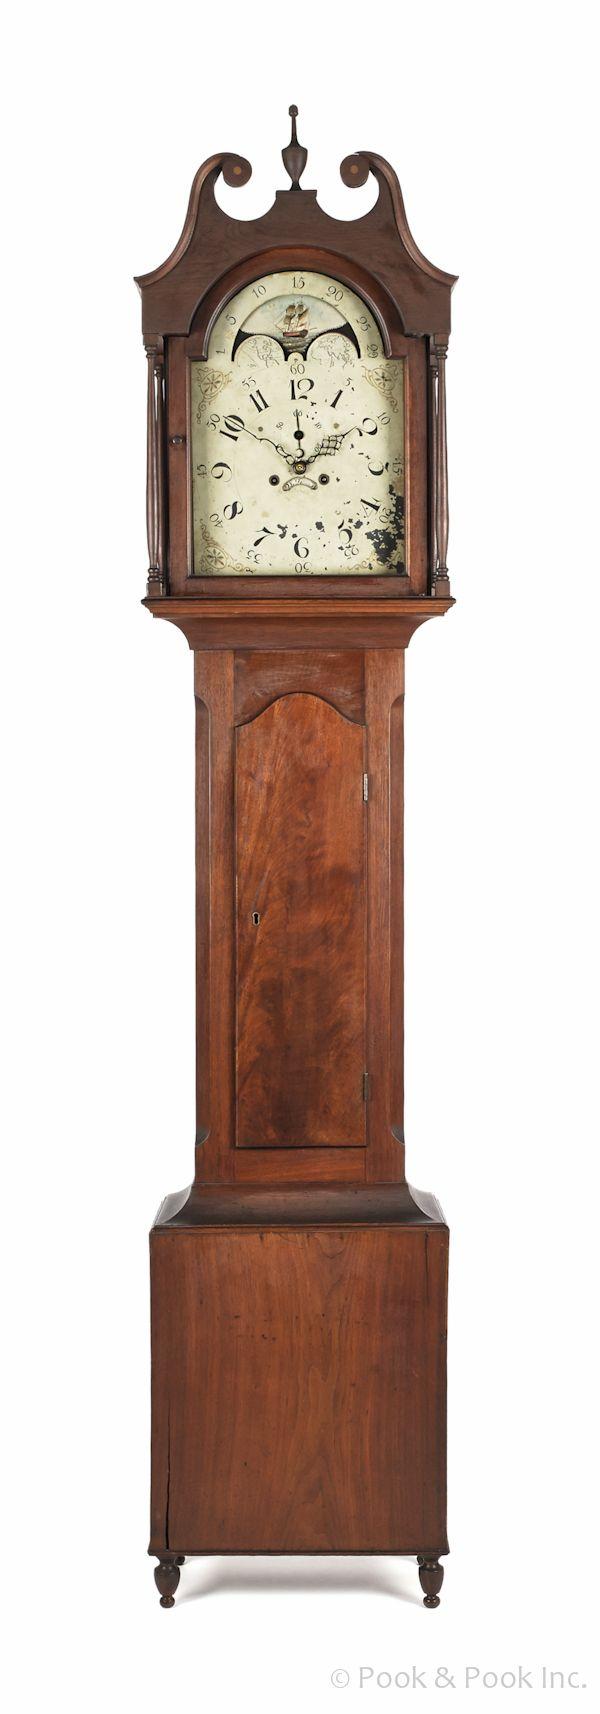 Vintage industrial clock double sided factory clock brilli 233 - Pennsylvania Federal Walnut Tall Case Clock Ca 1810 The Broken Arch Bonnet Enclosing